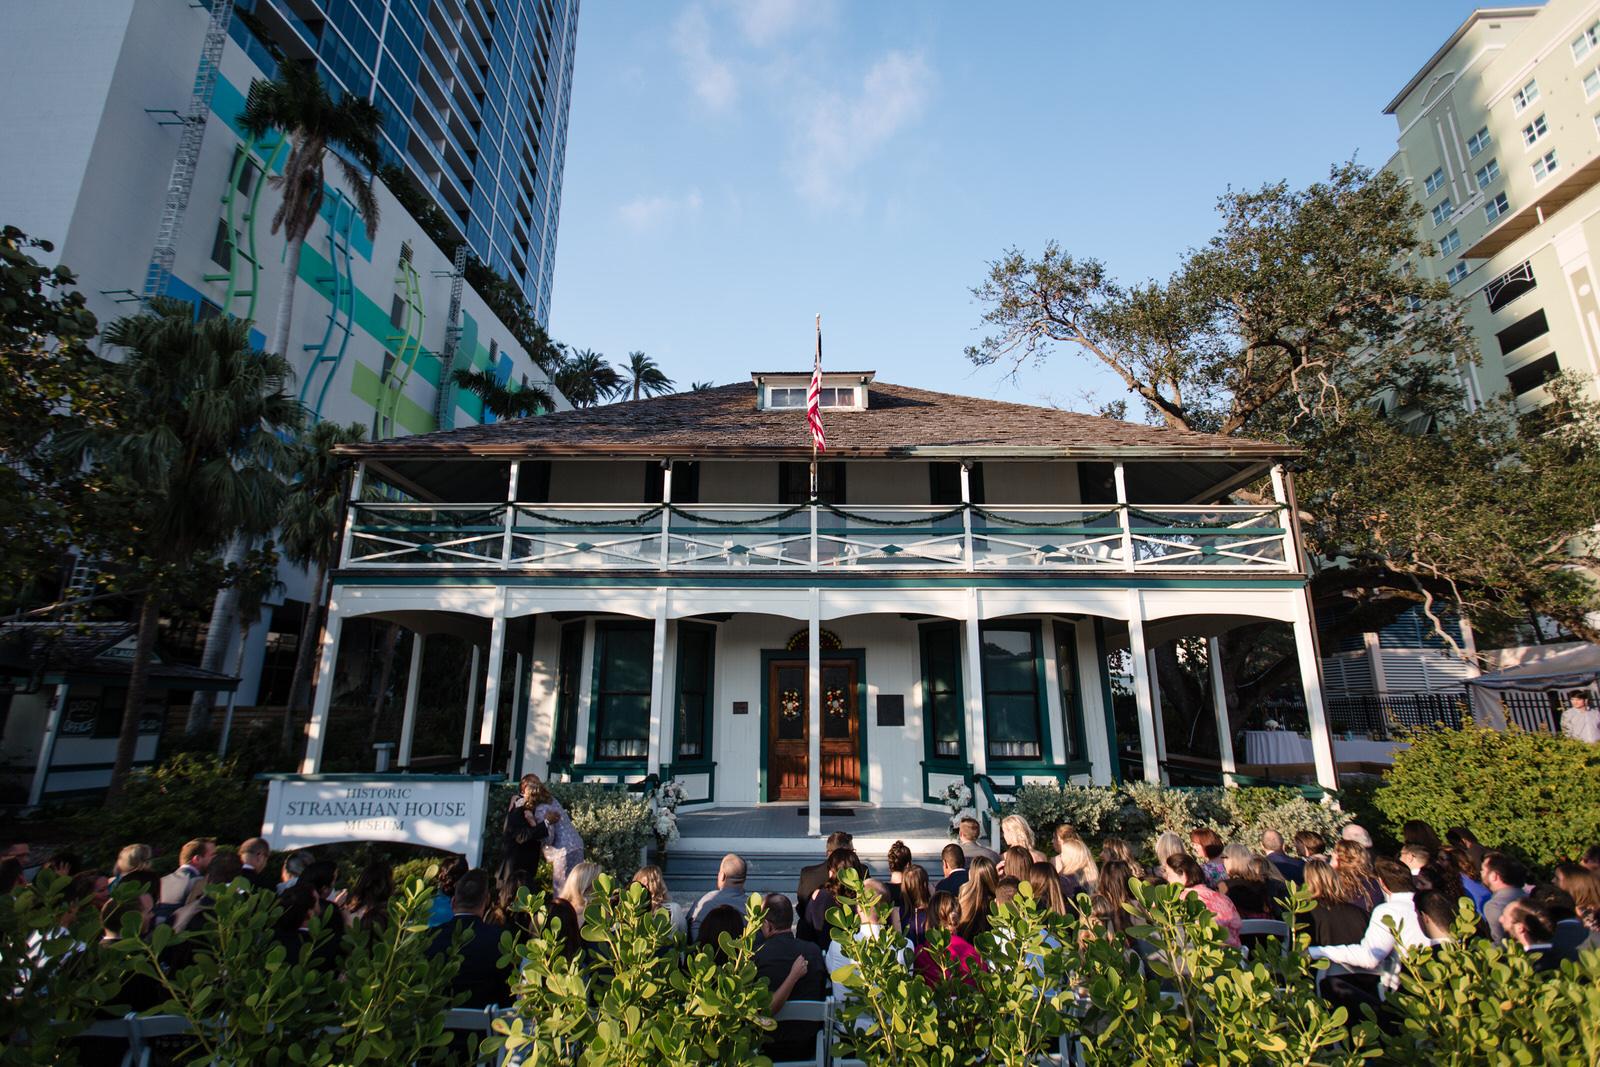 Wedding-Stranahan-House-Fort-Lauderdale